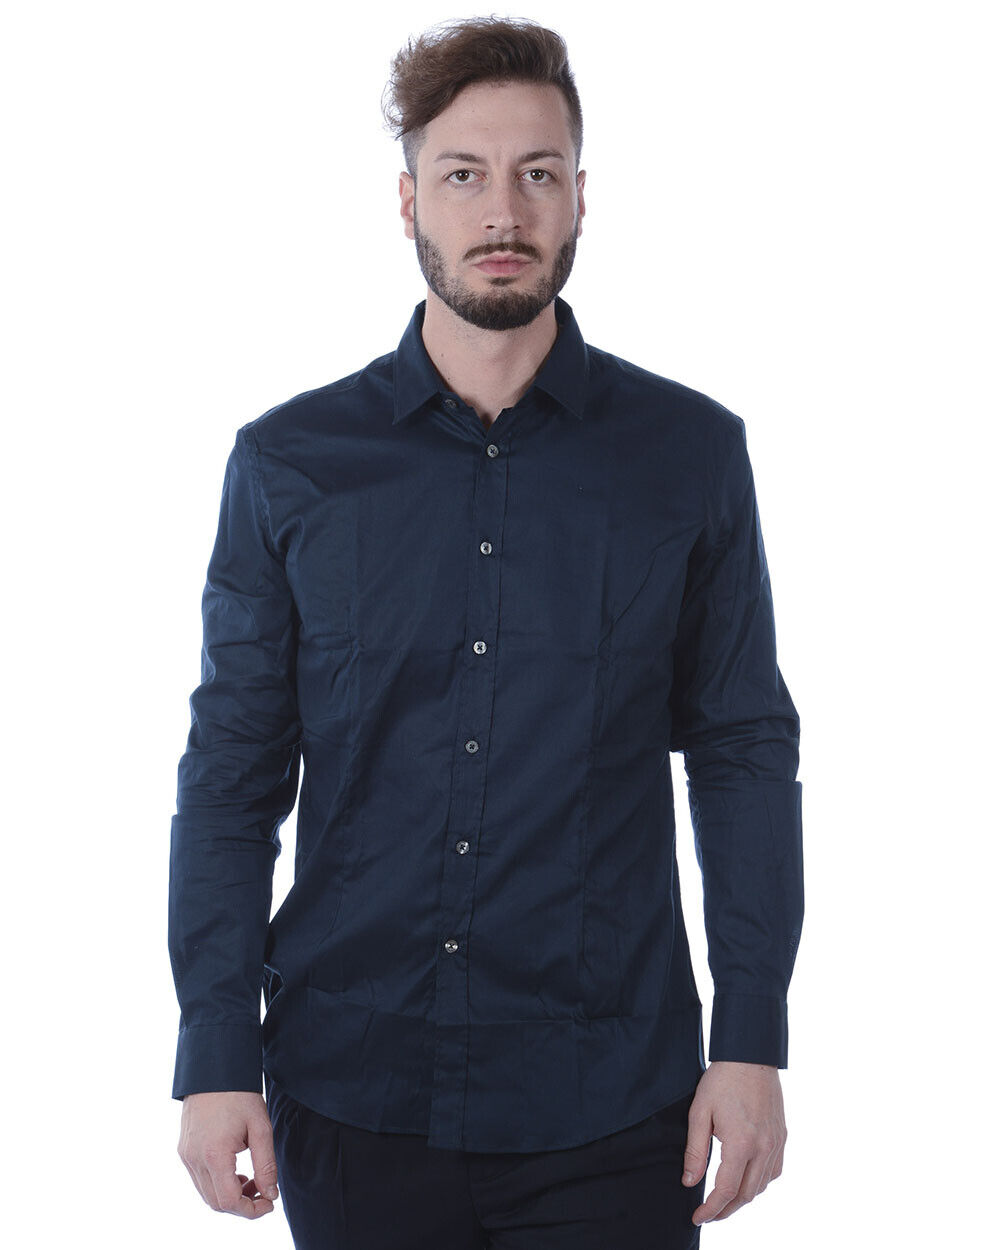 Daniele Alessandrini Shirt Cotton Man Blau C1507B7513700 23 Sz. 41 PUT OFFER